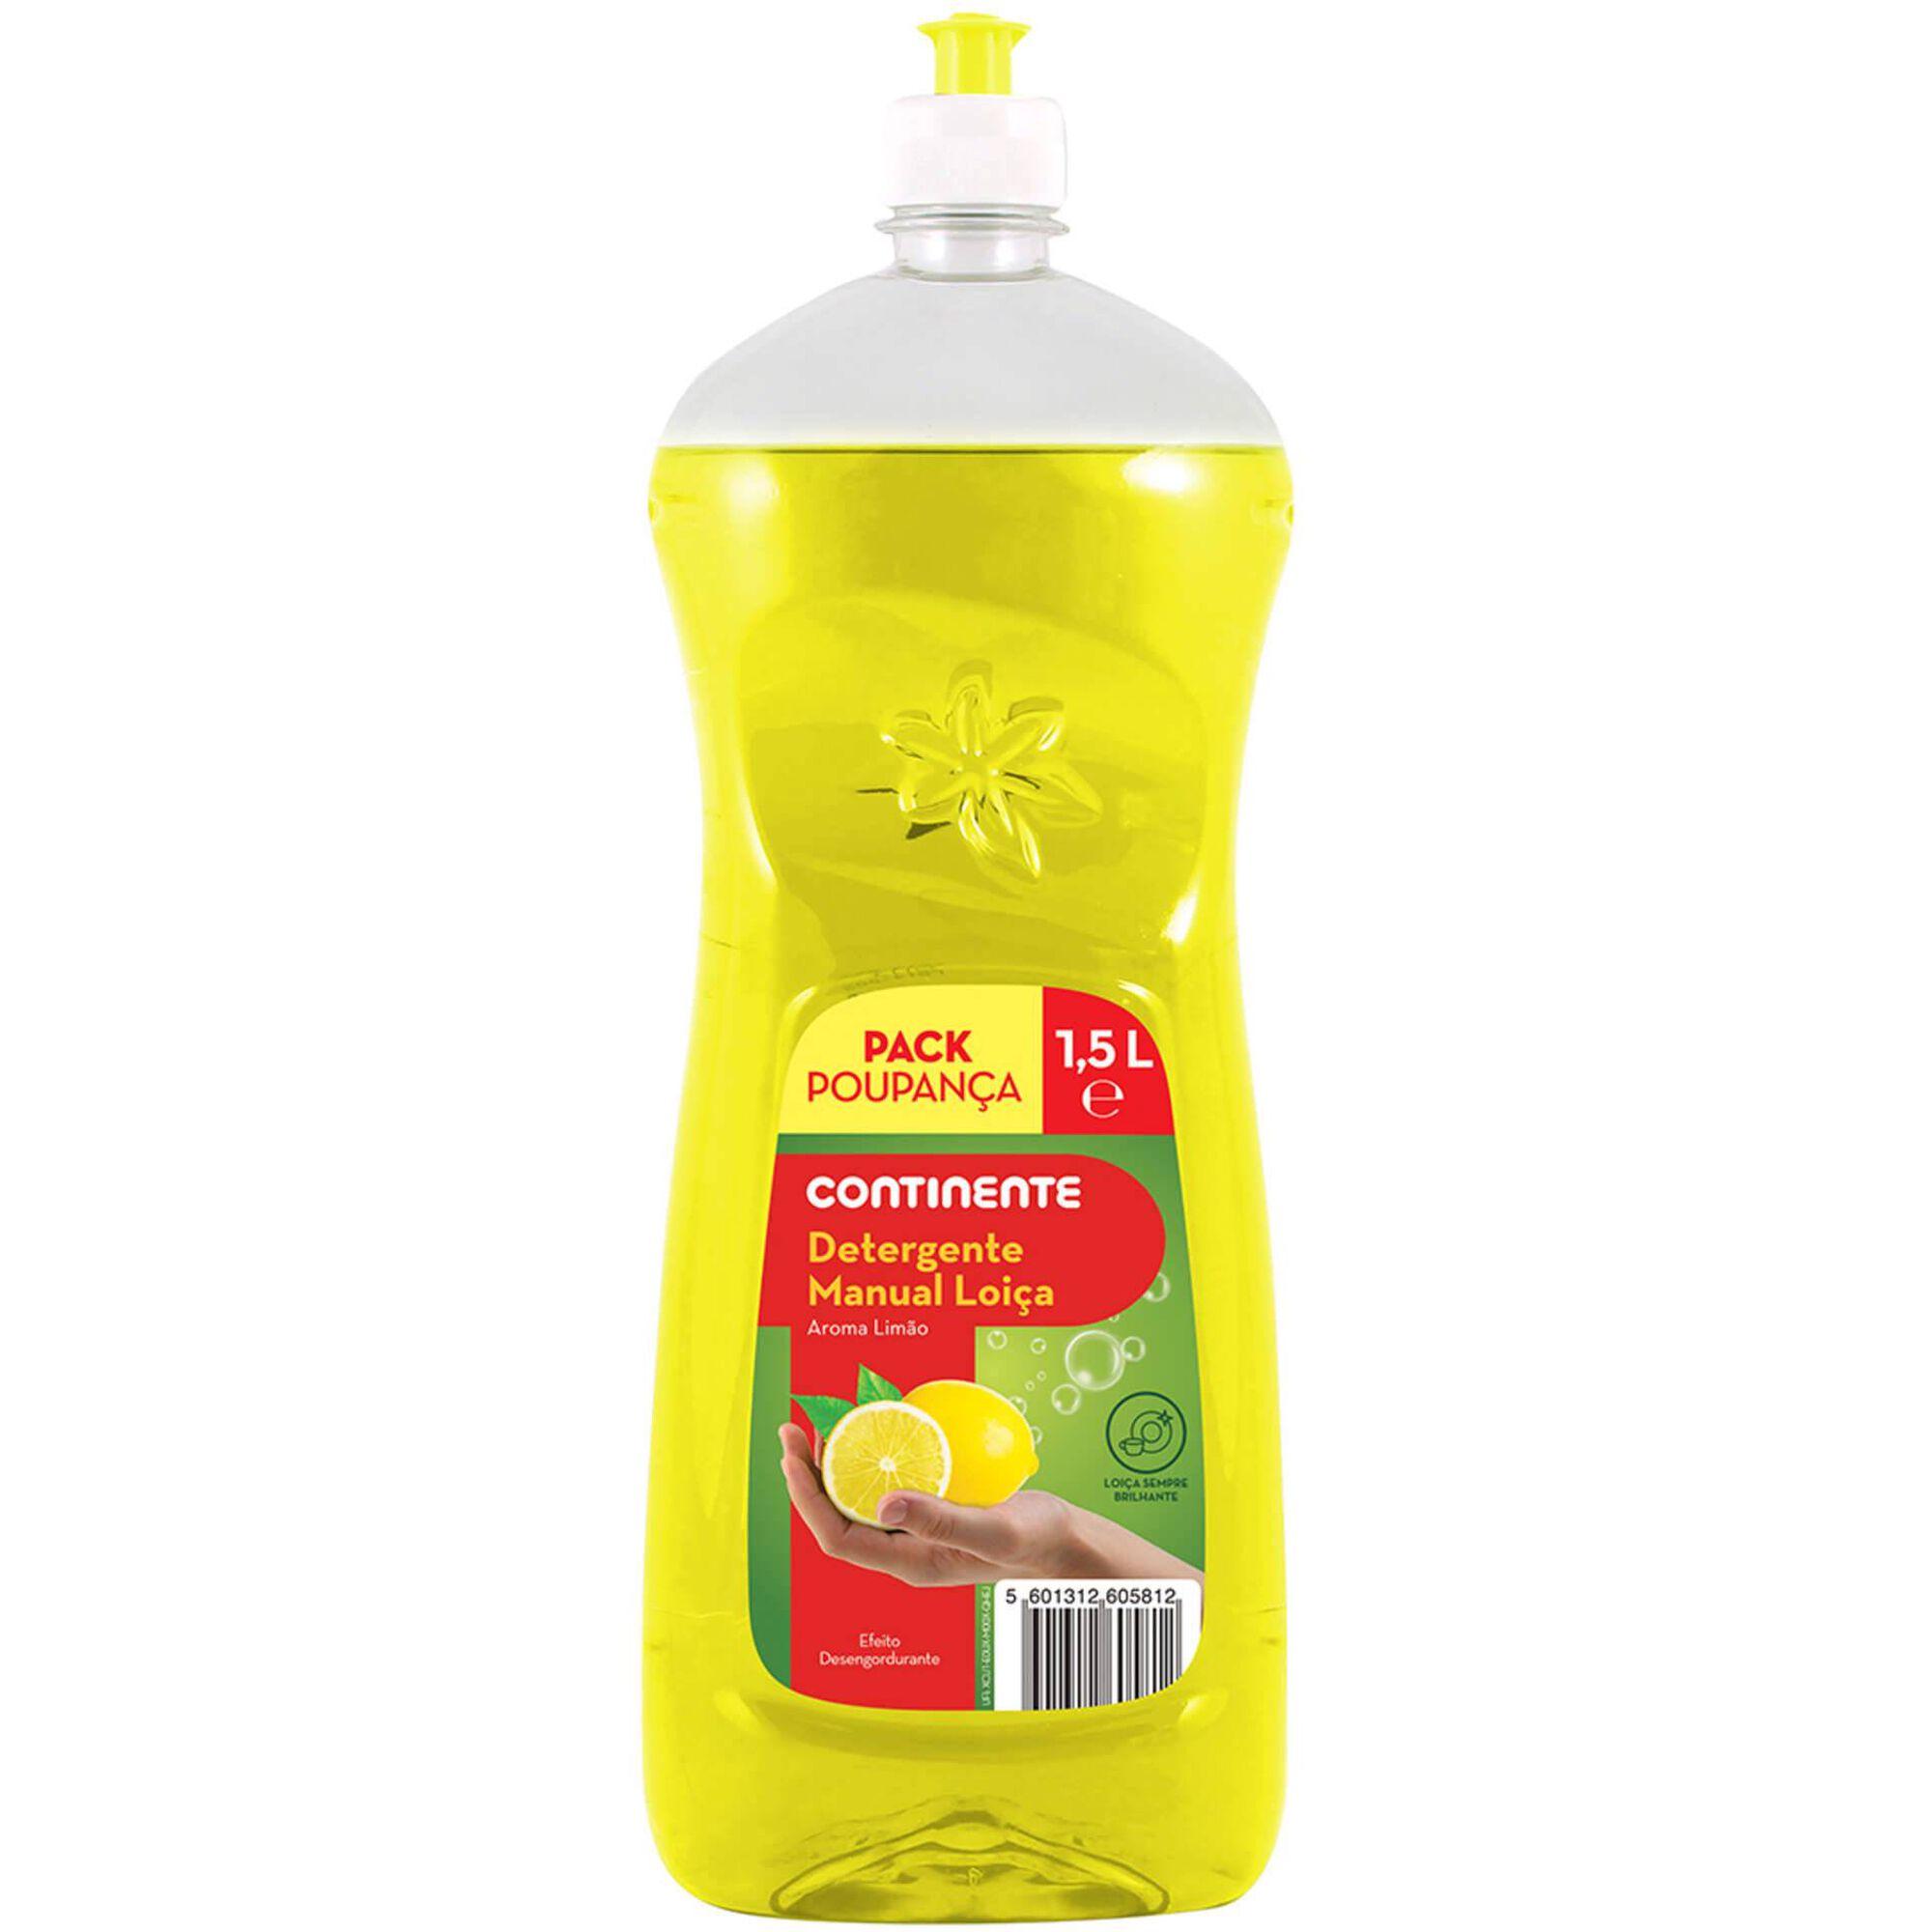 Detergente Manual Loiça Limão Pack Poupança